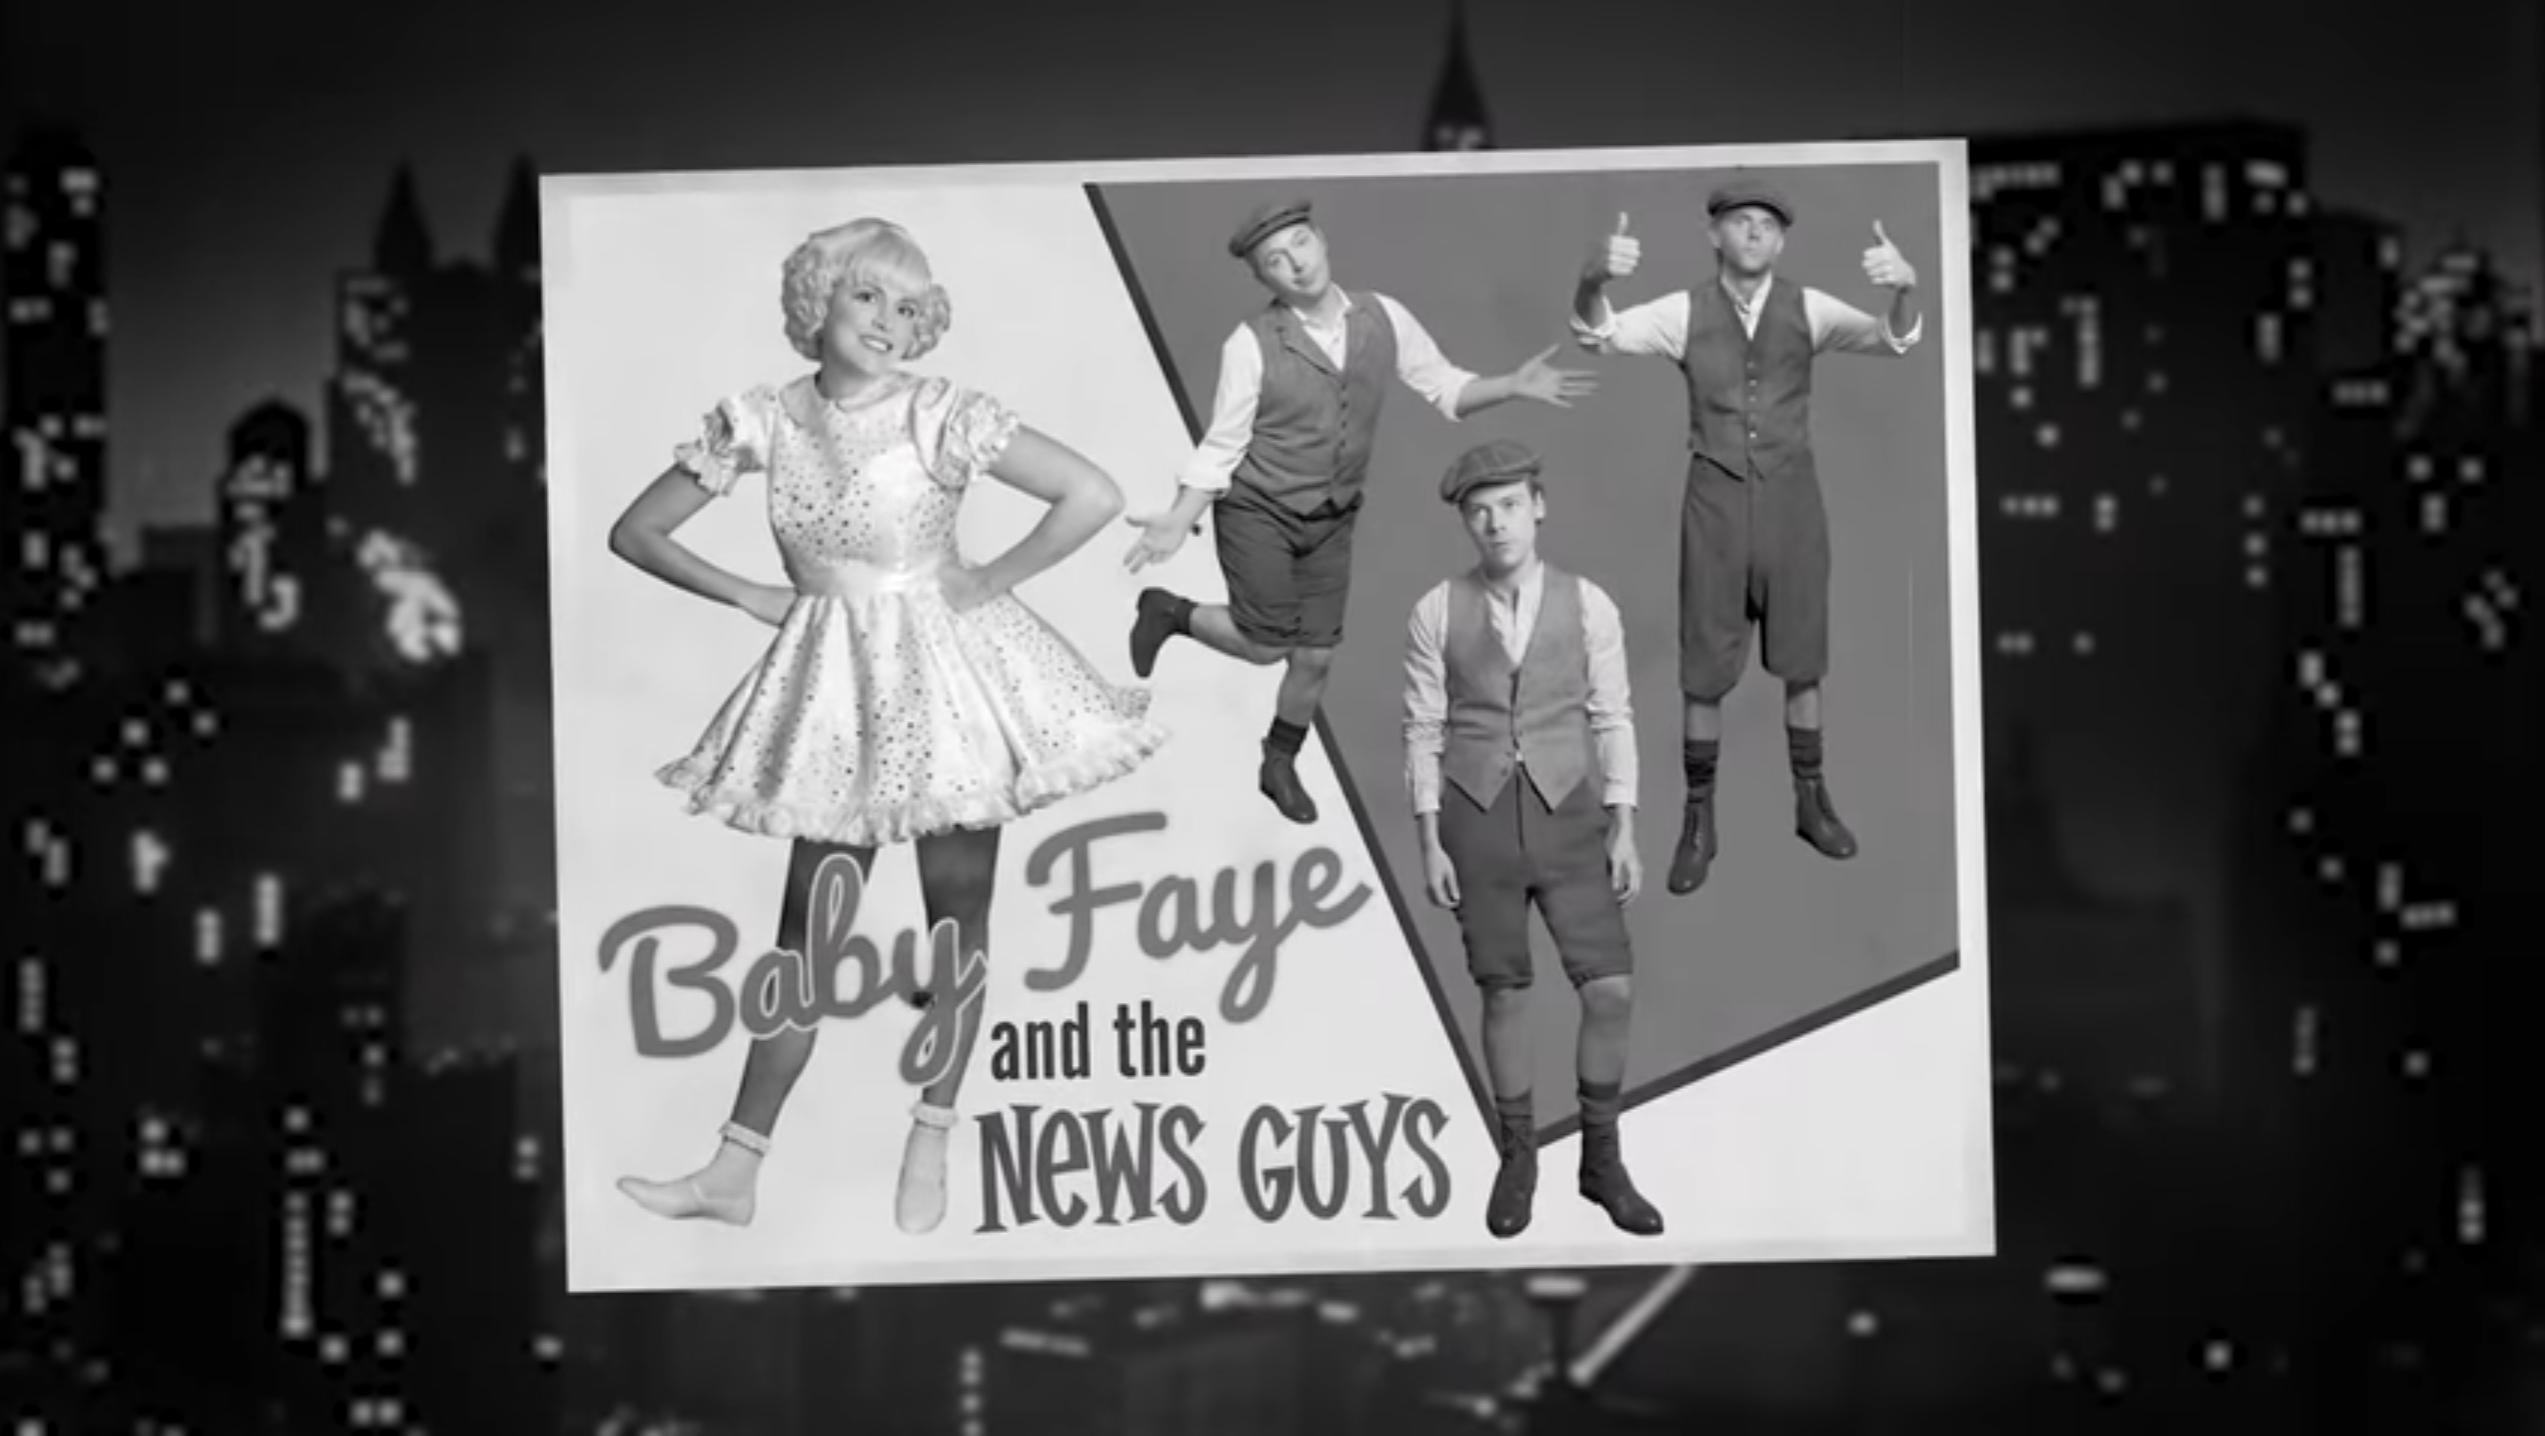 Saturday Night Live Parodies Gypsy With 'Baby Faye and Her Newsboys'